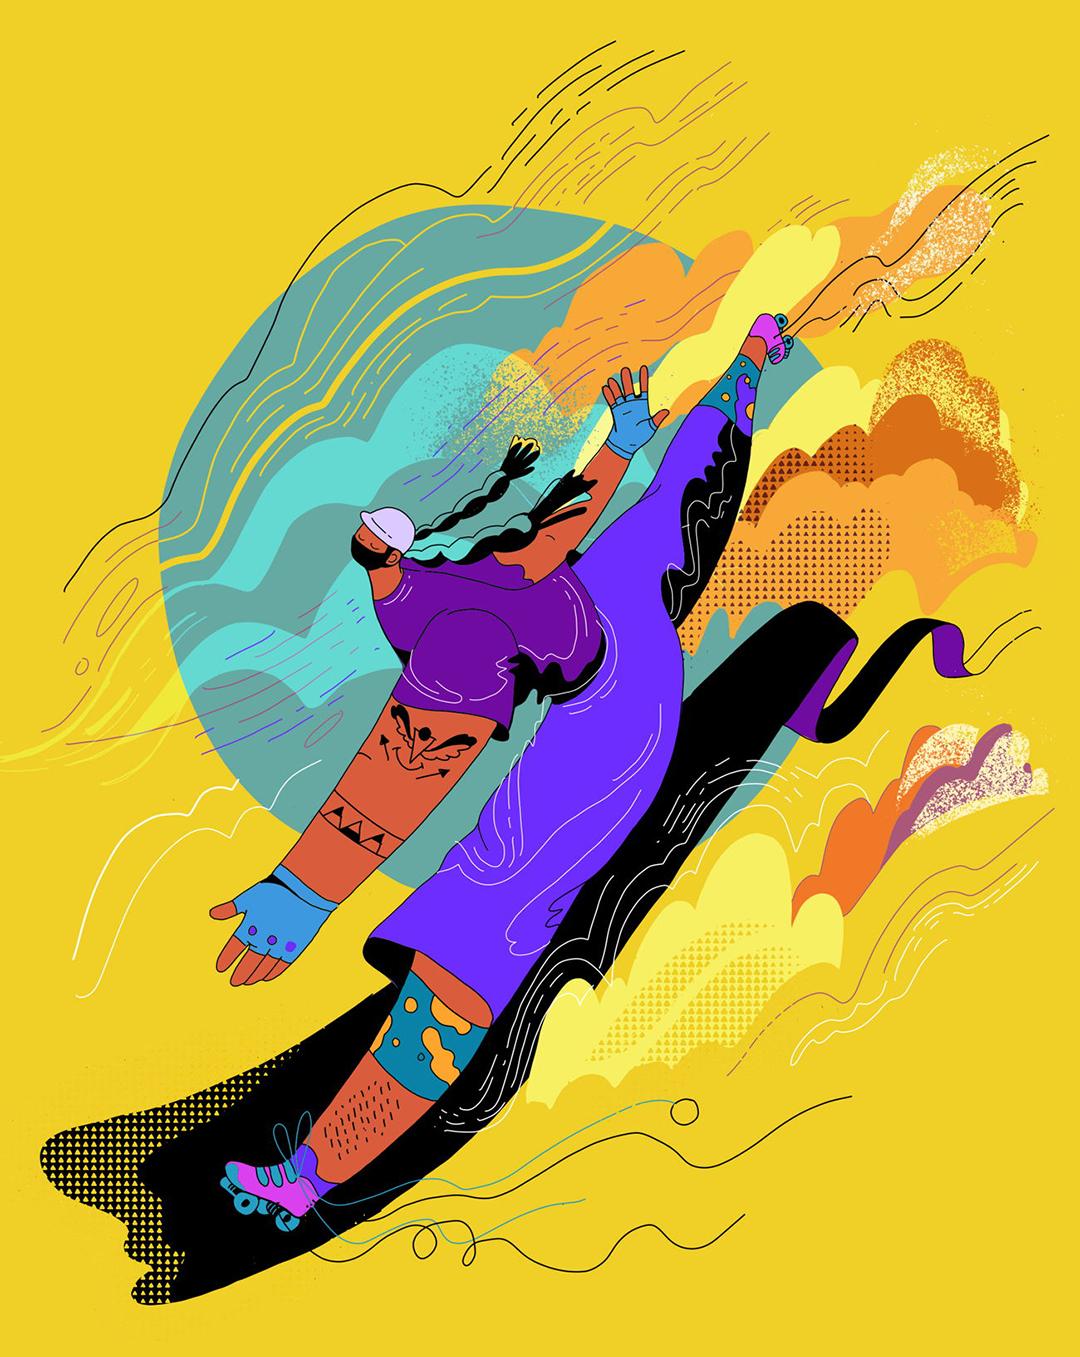 GirlsclubAsia-Illustration-Animation-Lilian Darmono-Skater